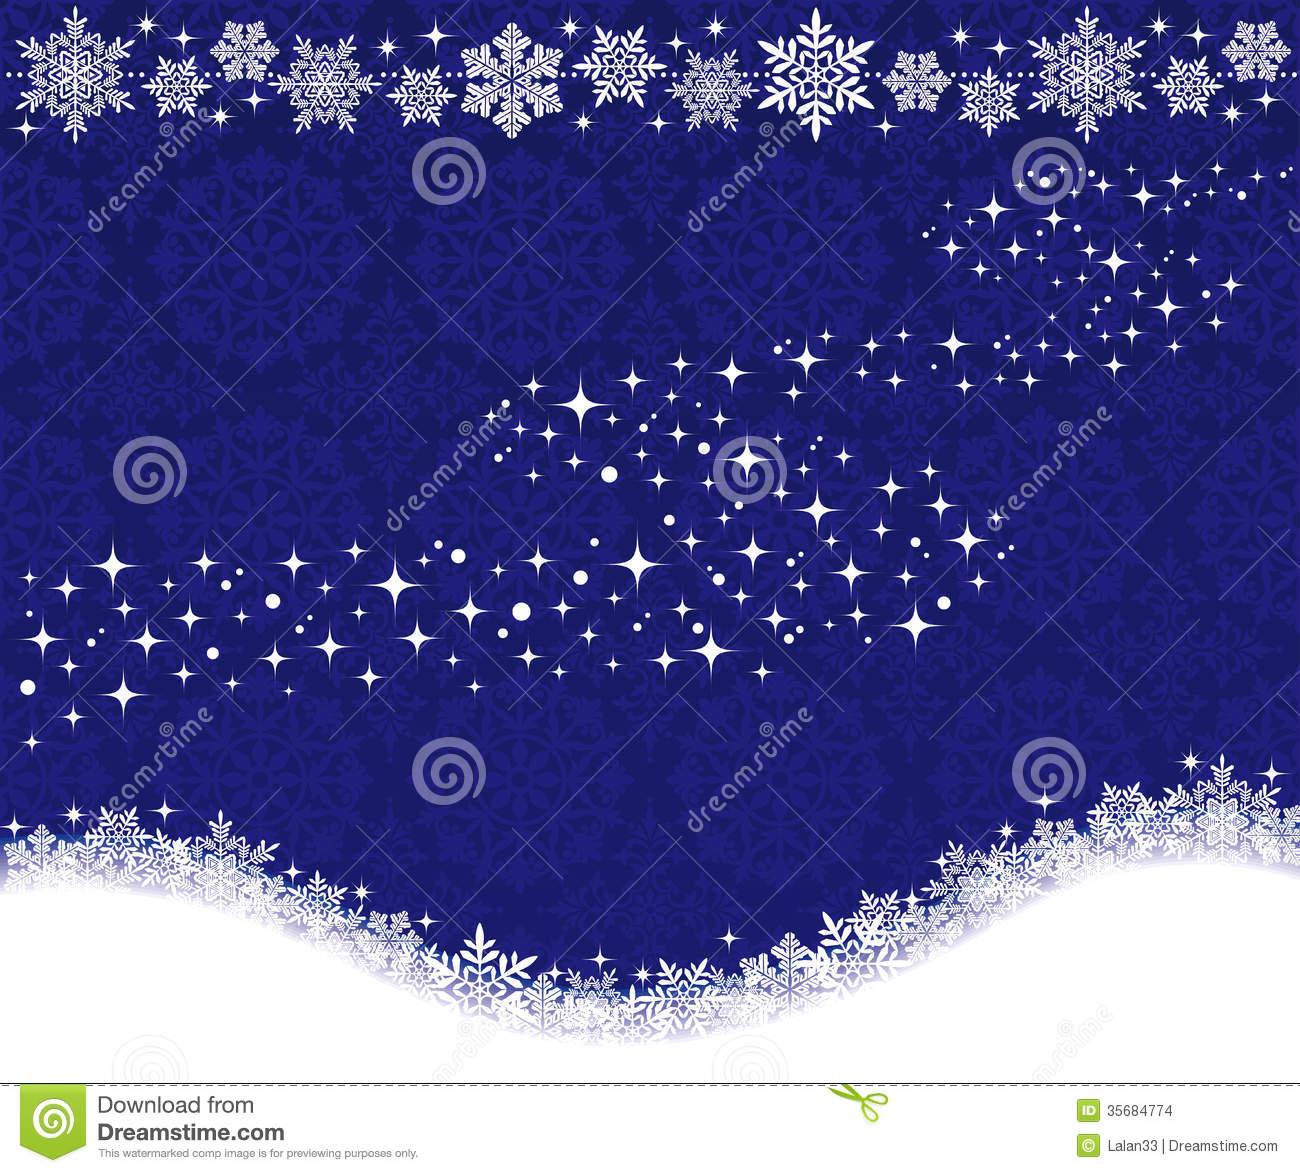 Milky Way Galaxy Clipart Snowflakes And Milky Way #NxBiNN.